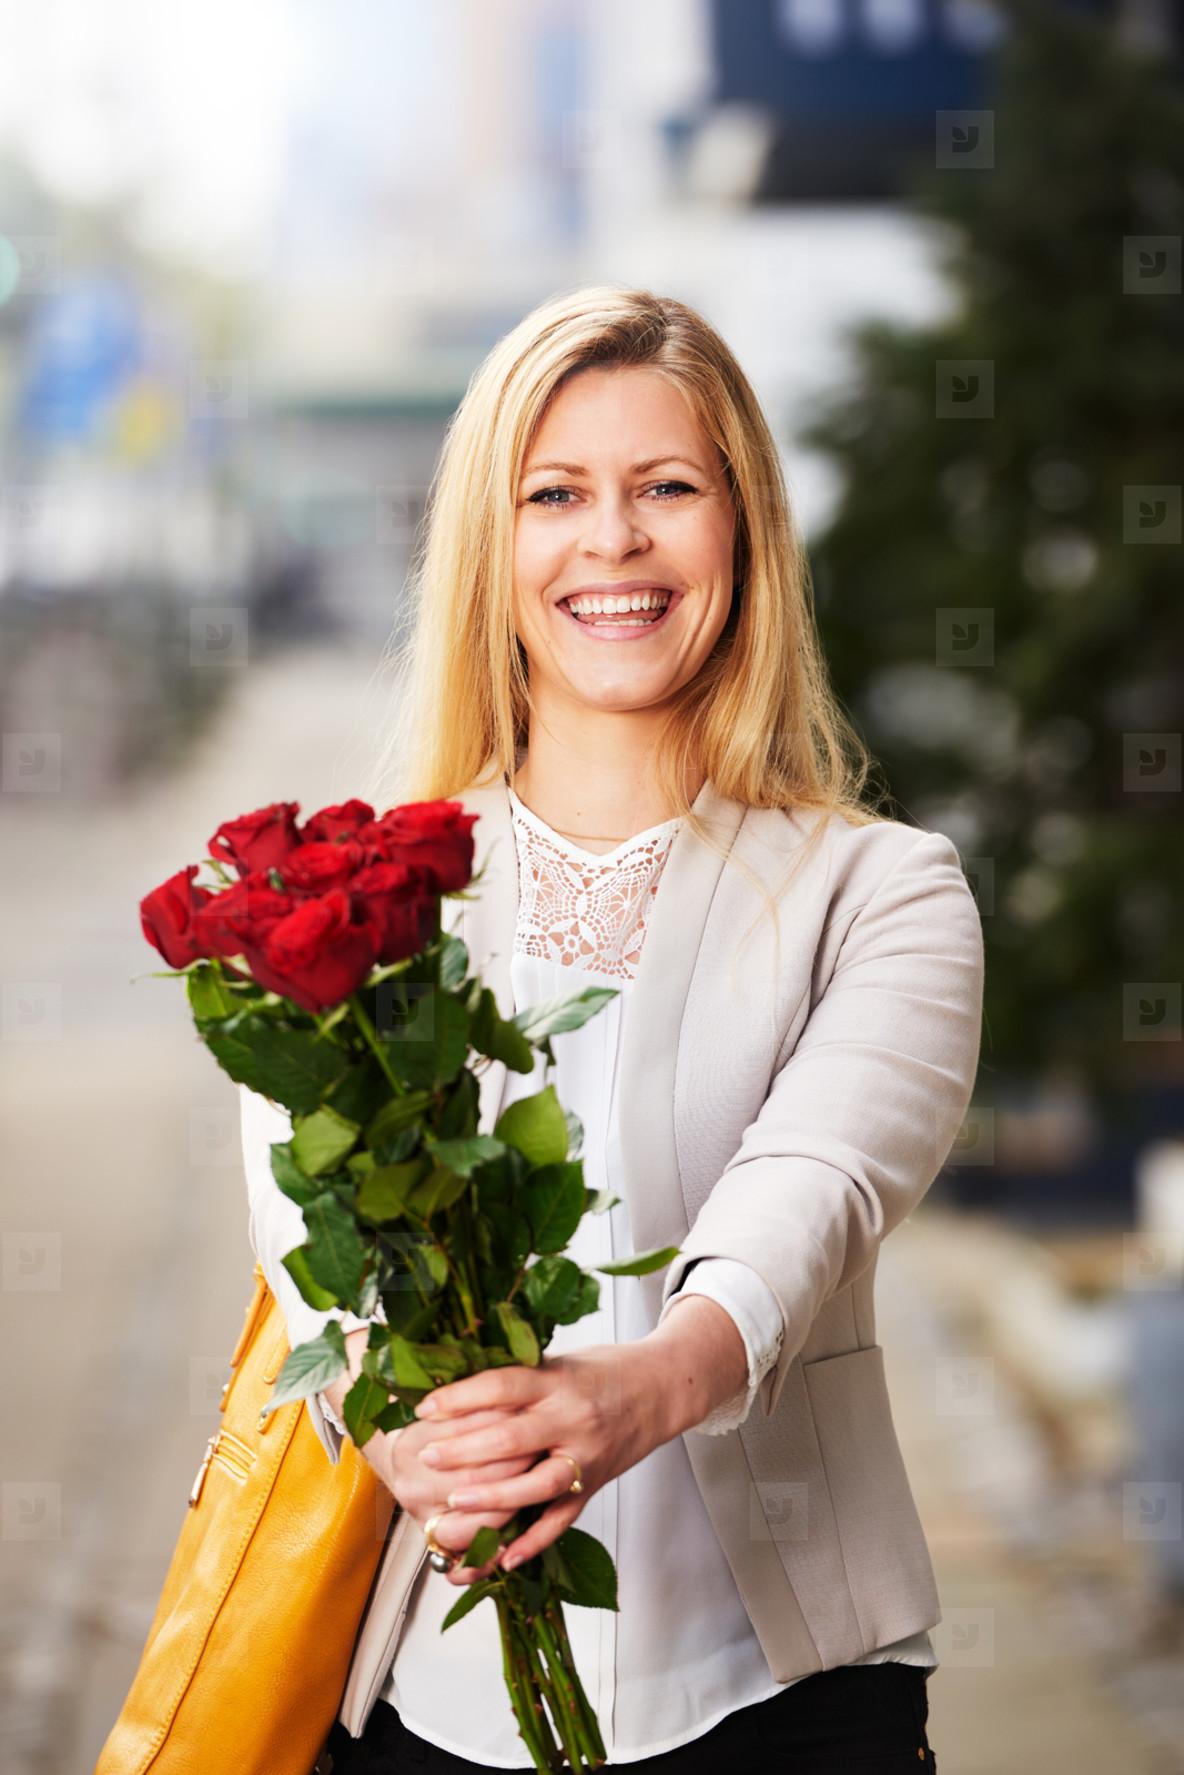 Professional white woman smiling